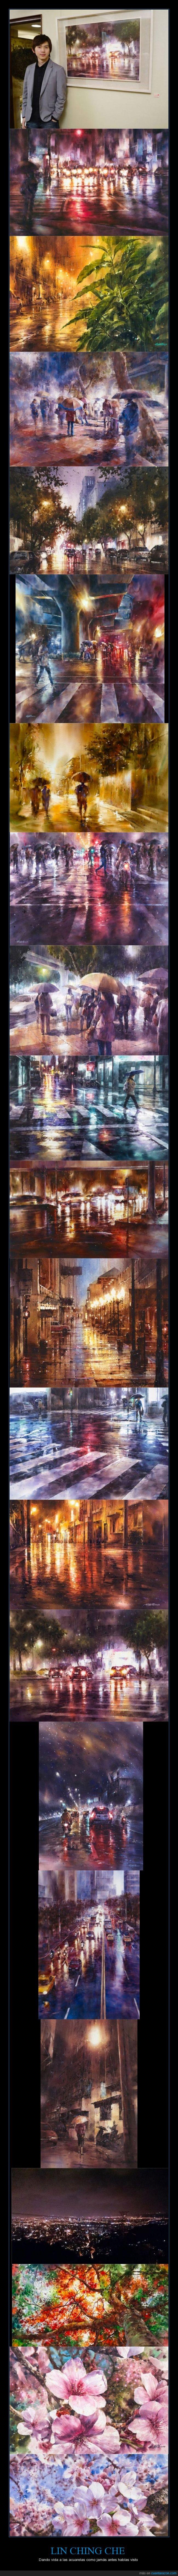 acuarela,agua,arte,artista,cerezo,ciudad,cuadro,Lin Ching Che,lluvia,pintar,pintura,taiwan,taiwanes